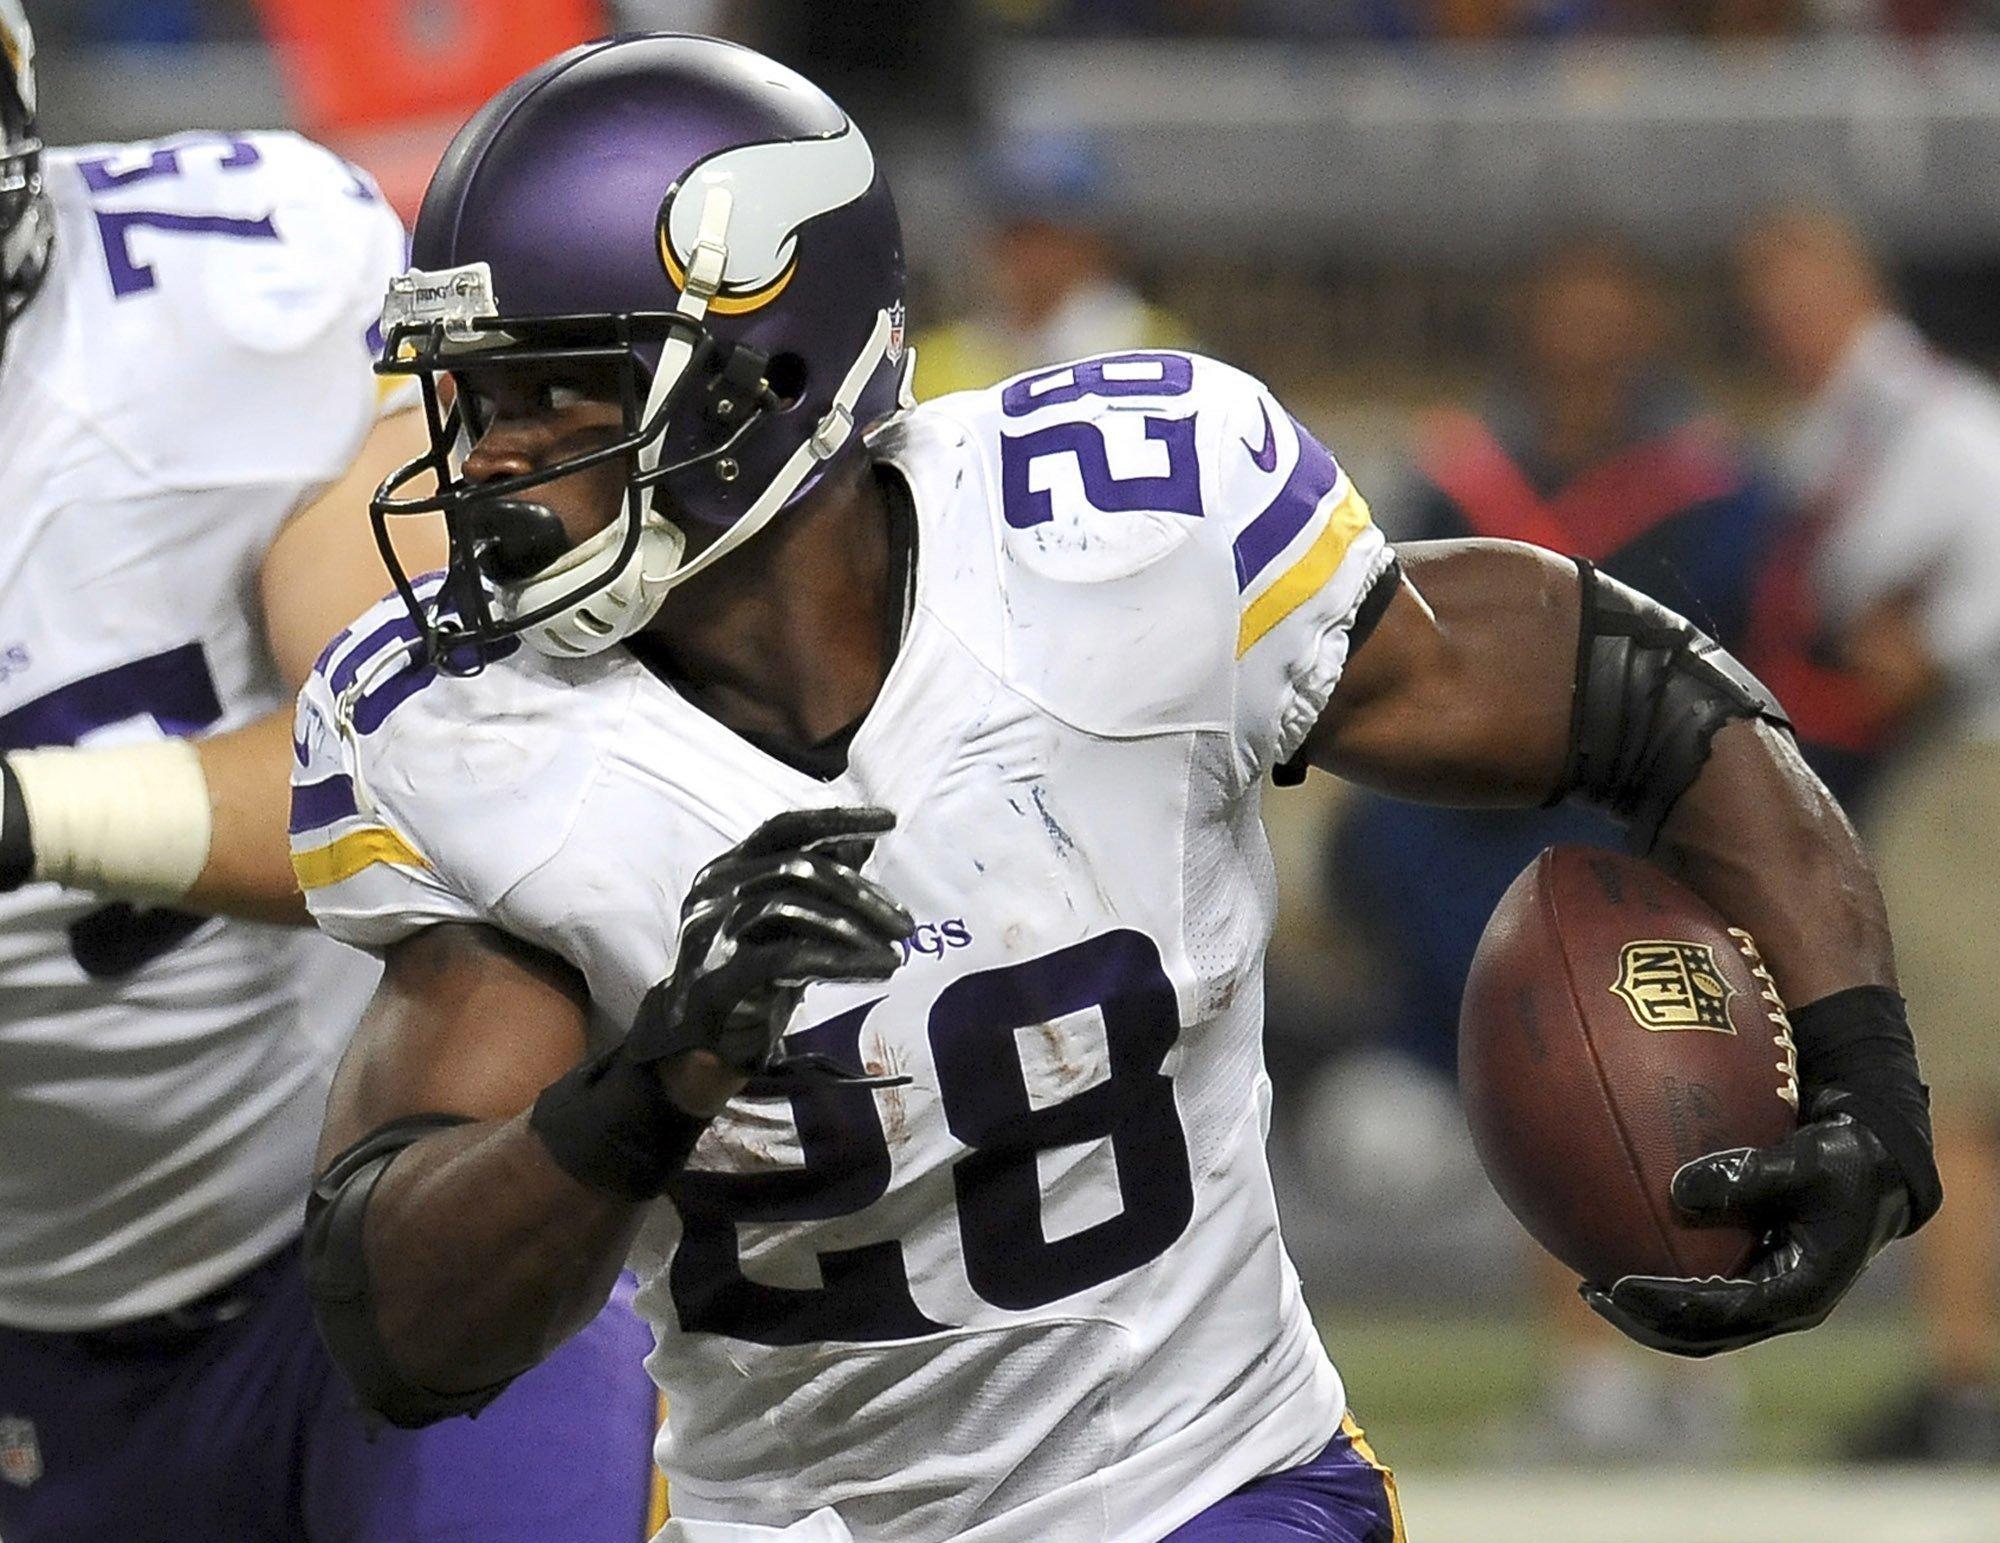 b44e58ec4 High hopes  Vikings finally pair Peterson with Bridgewater - The San Diego  Union-Tribune